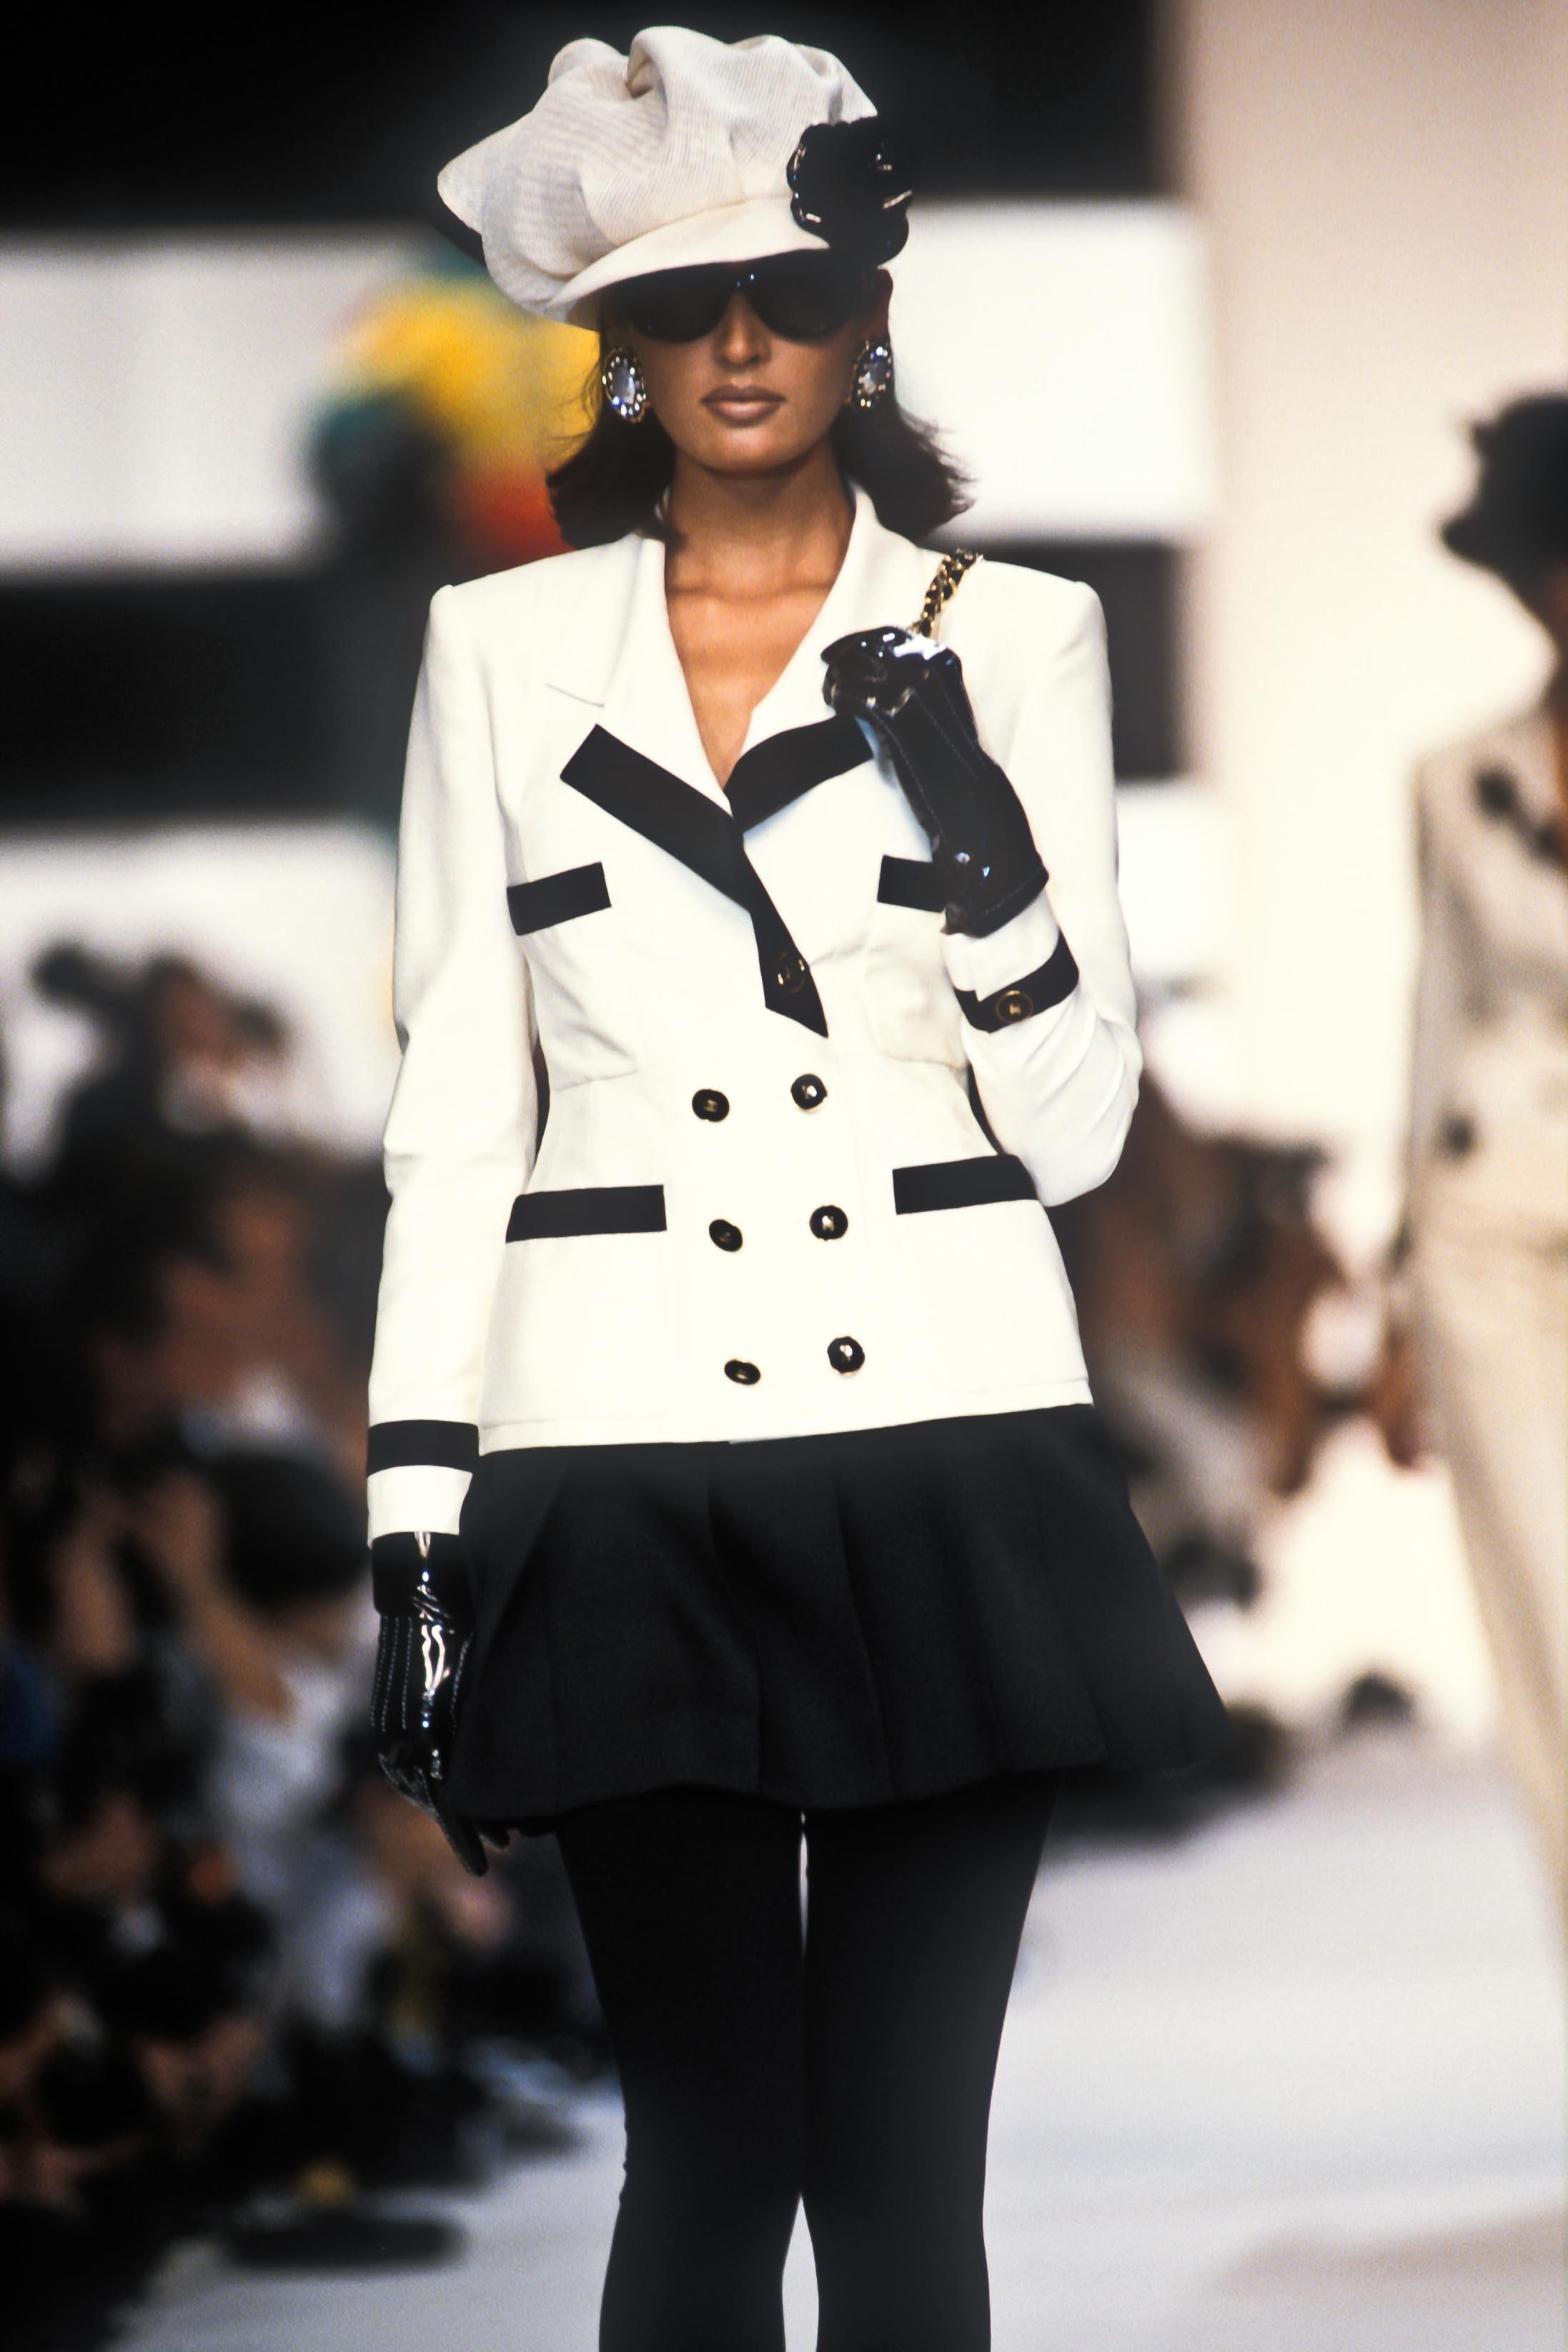 Gail Elliott GBR 1995